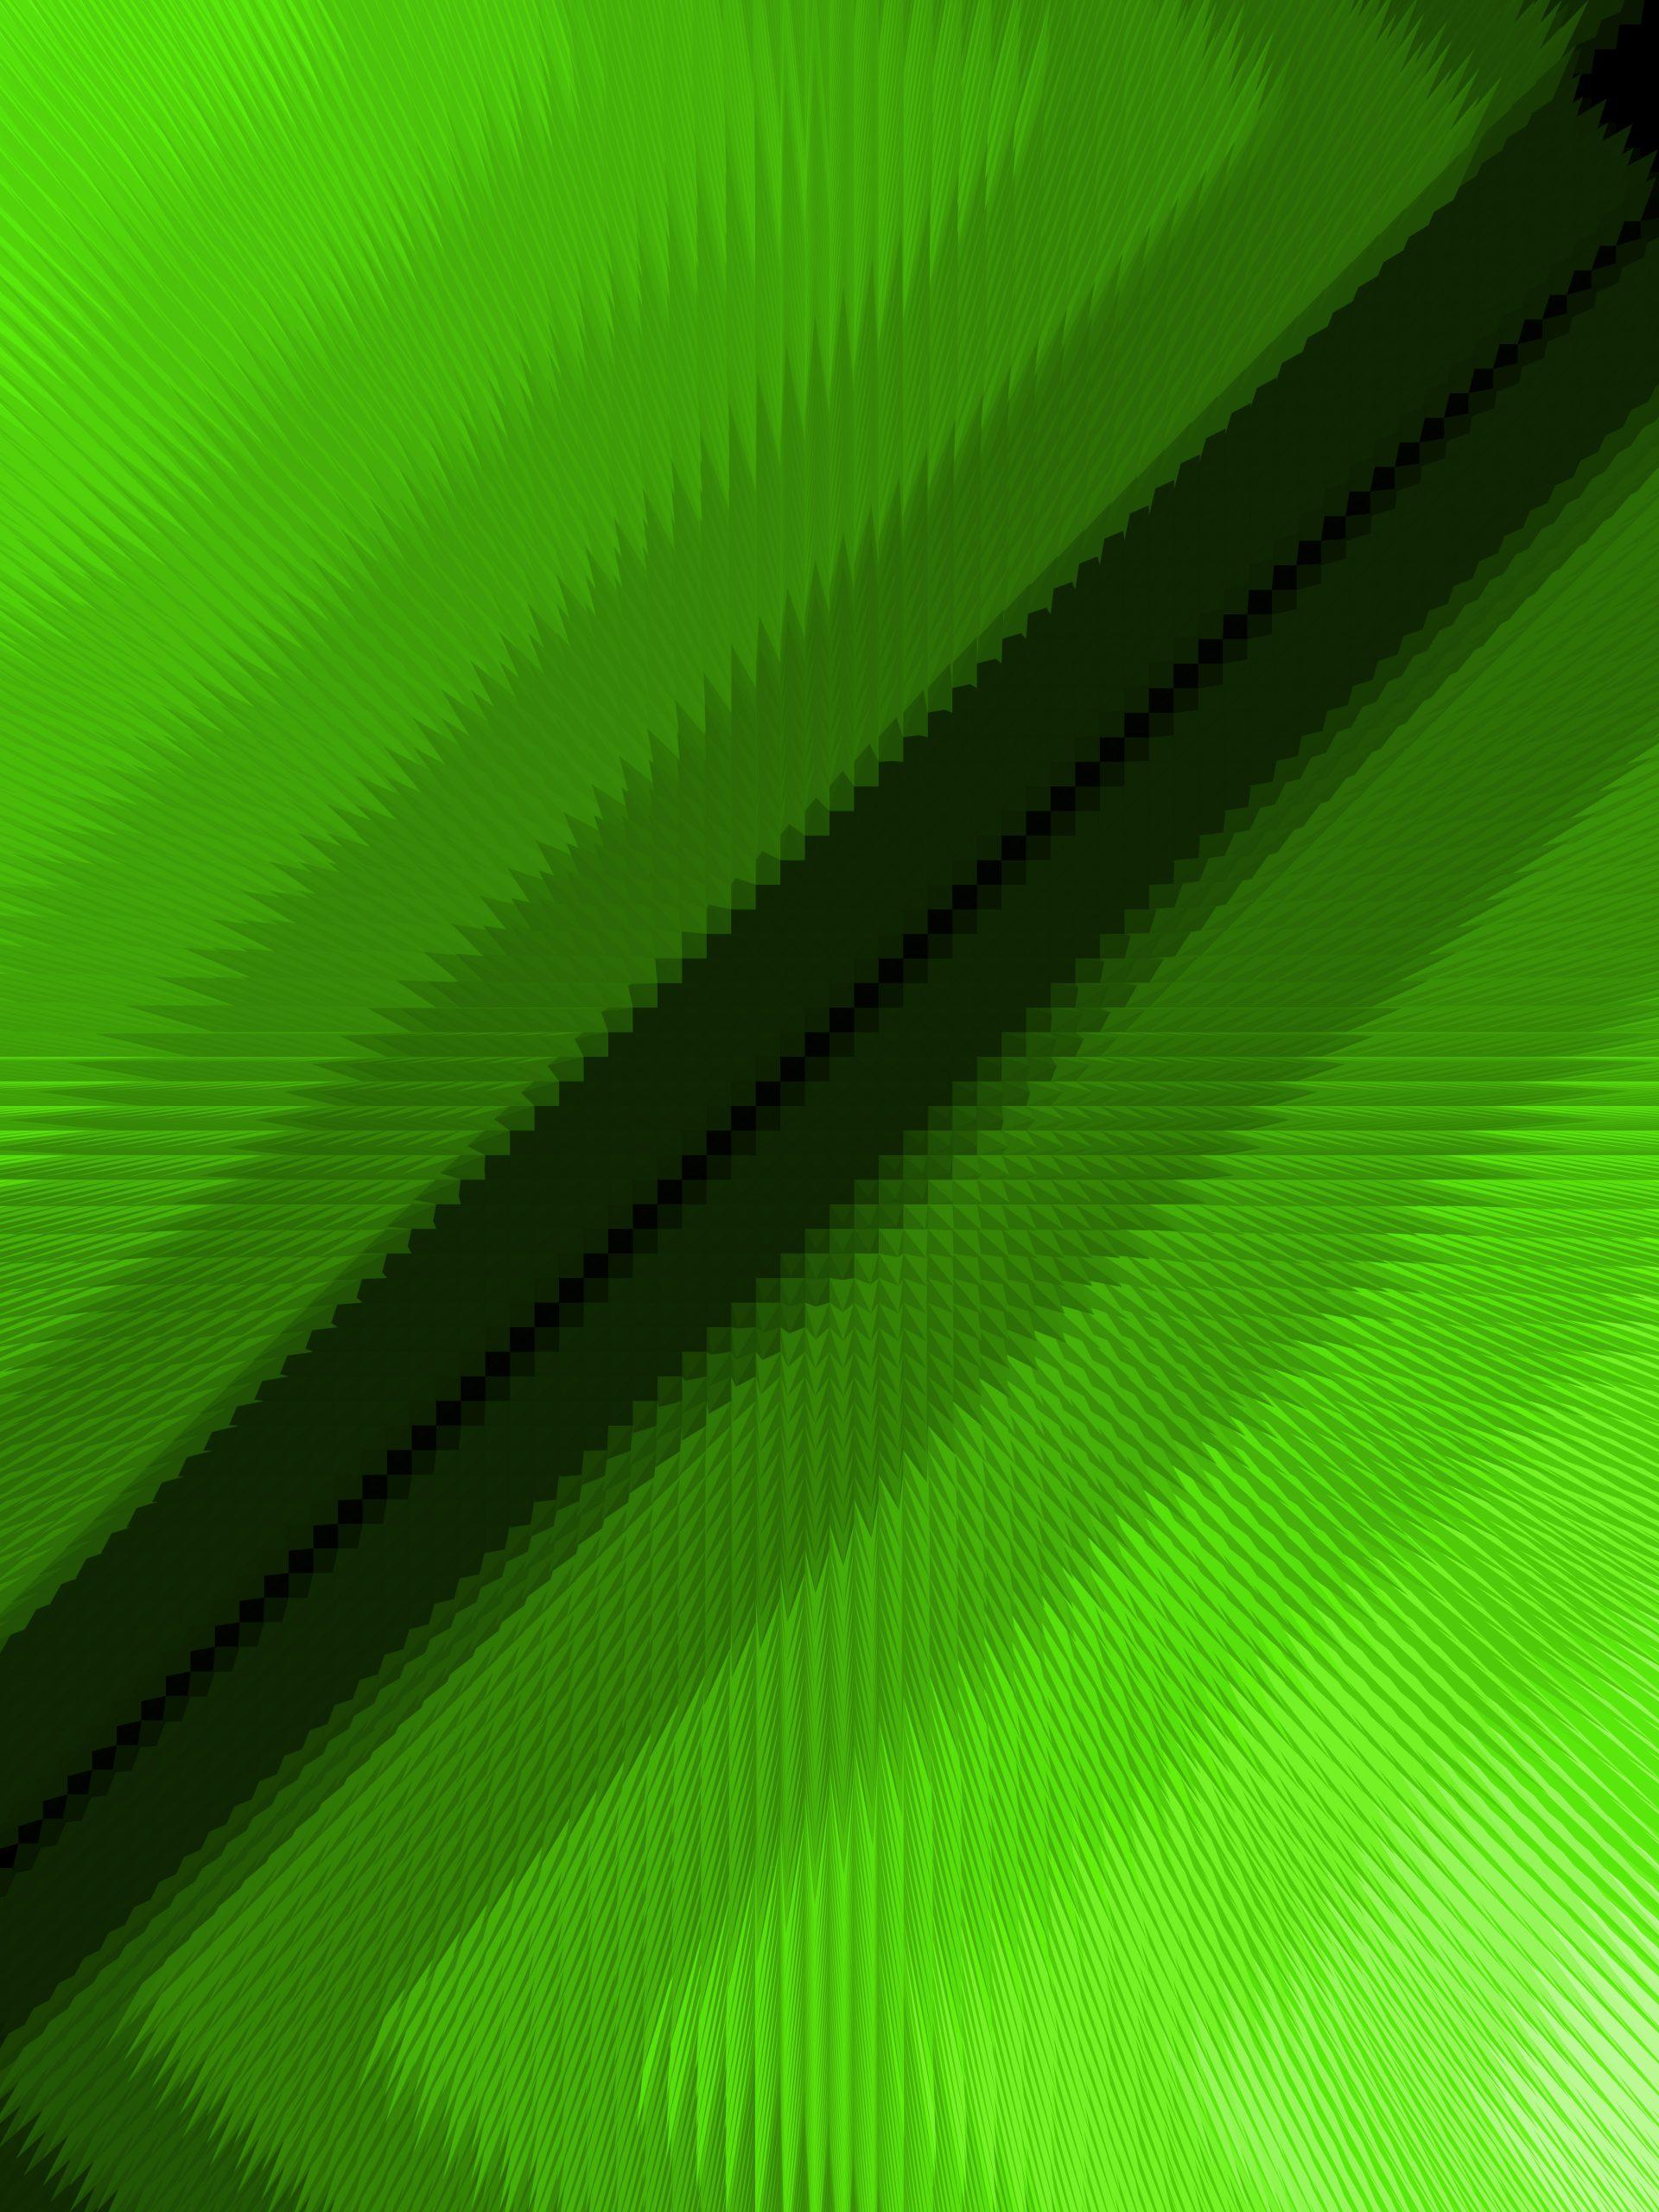 A green design